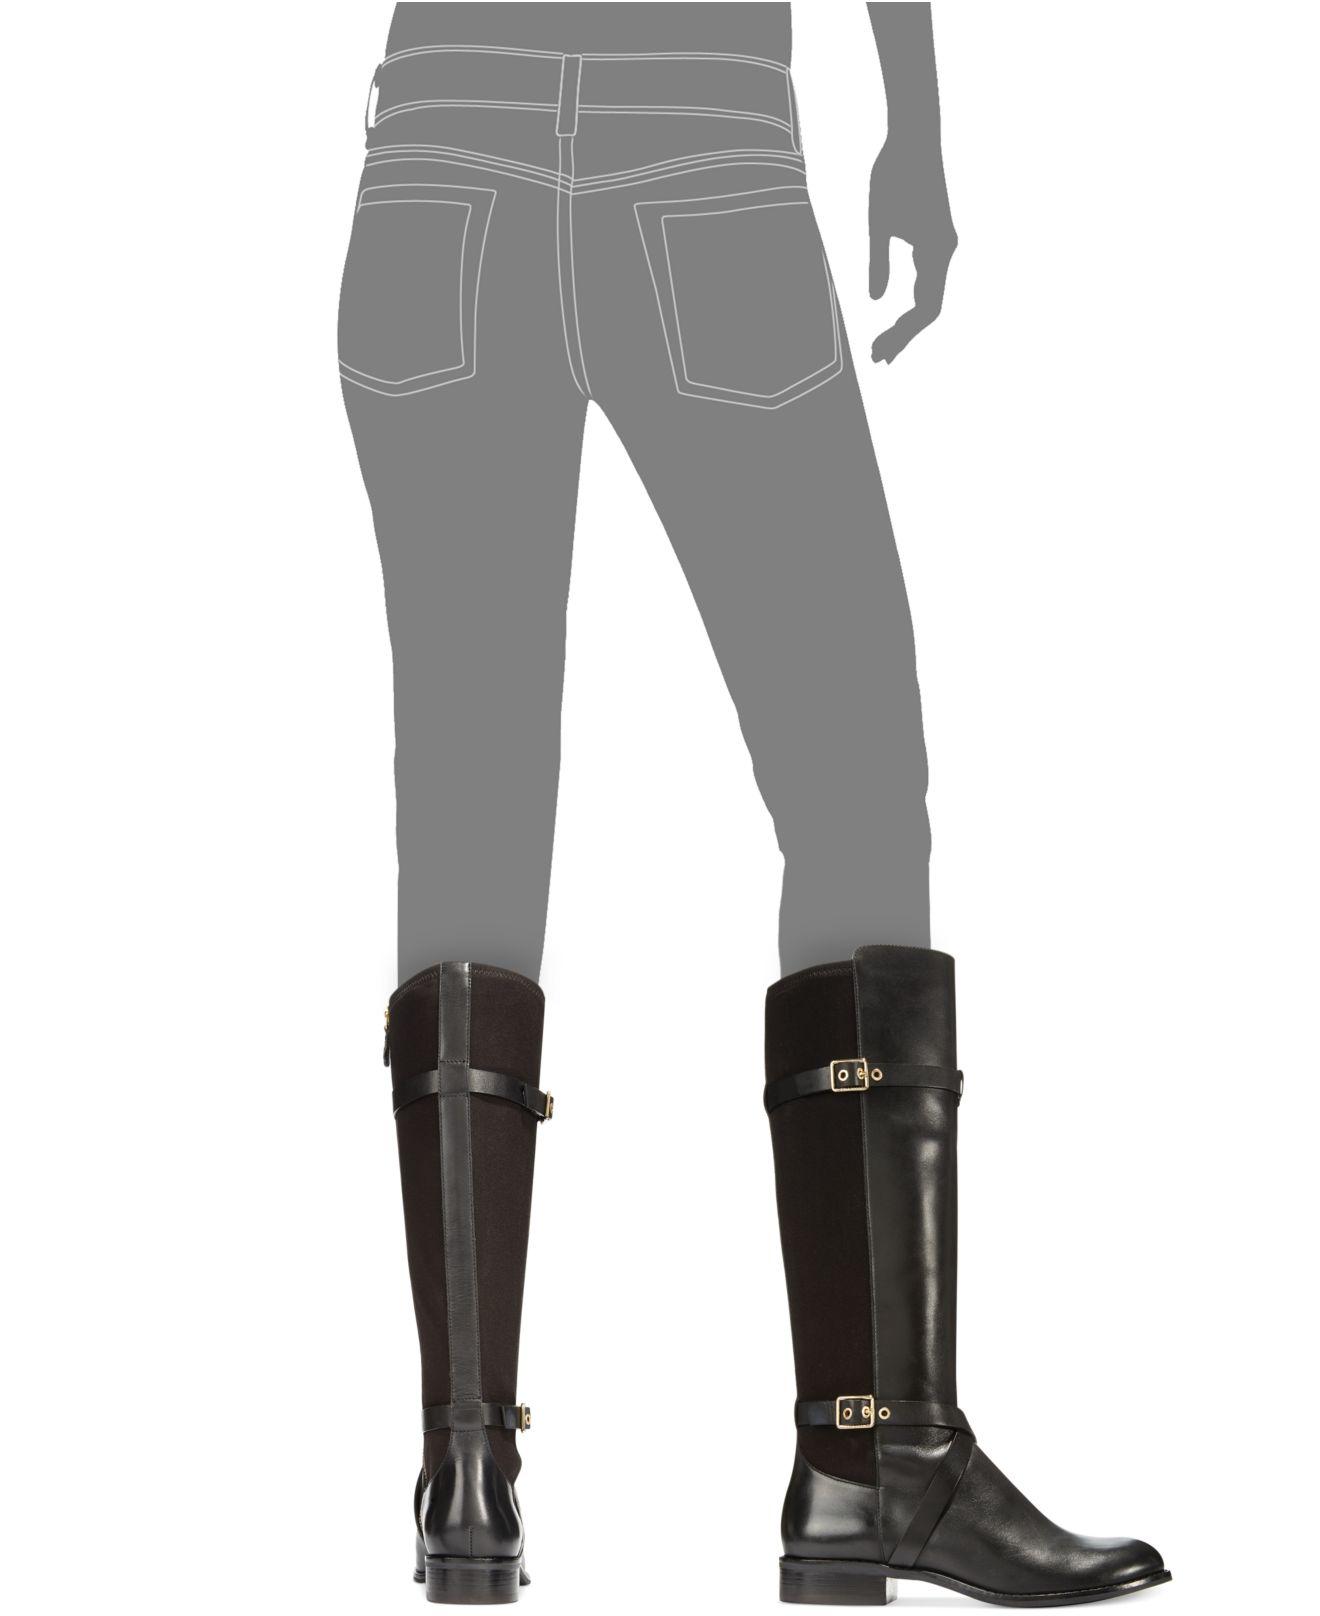 6d3c4c3656 Cole Haan Women'S Dorian Stretch Boots in Black - Lyst